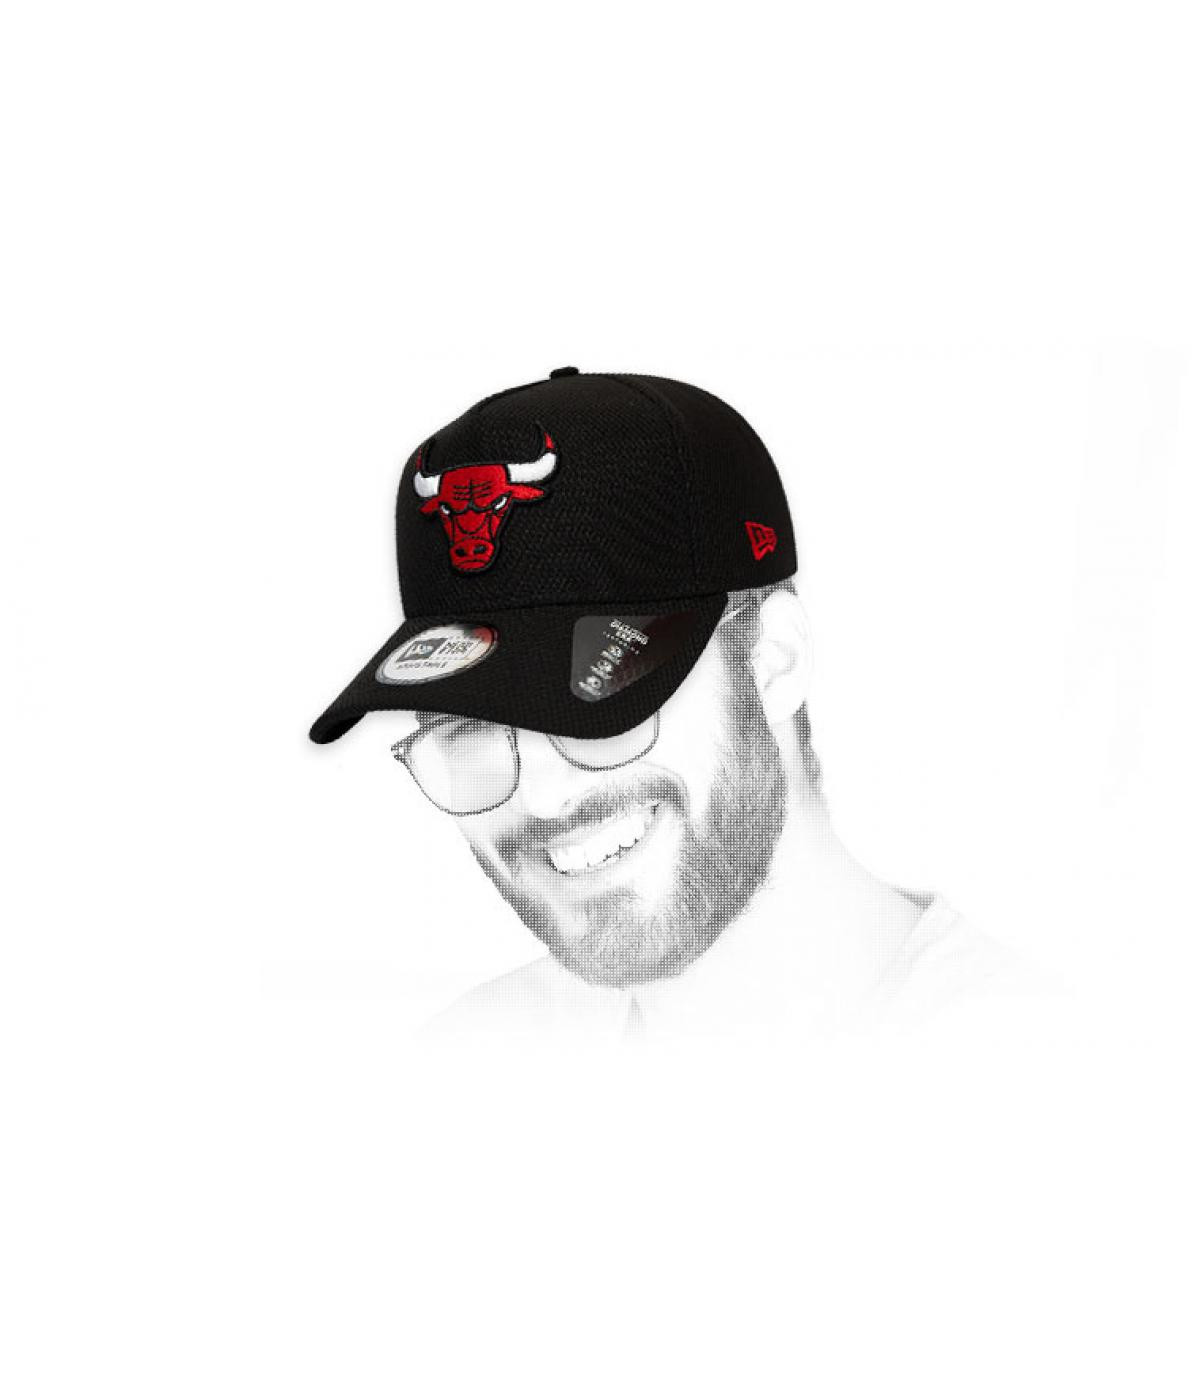 gorra Bulls negro logo